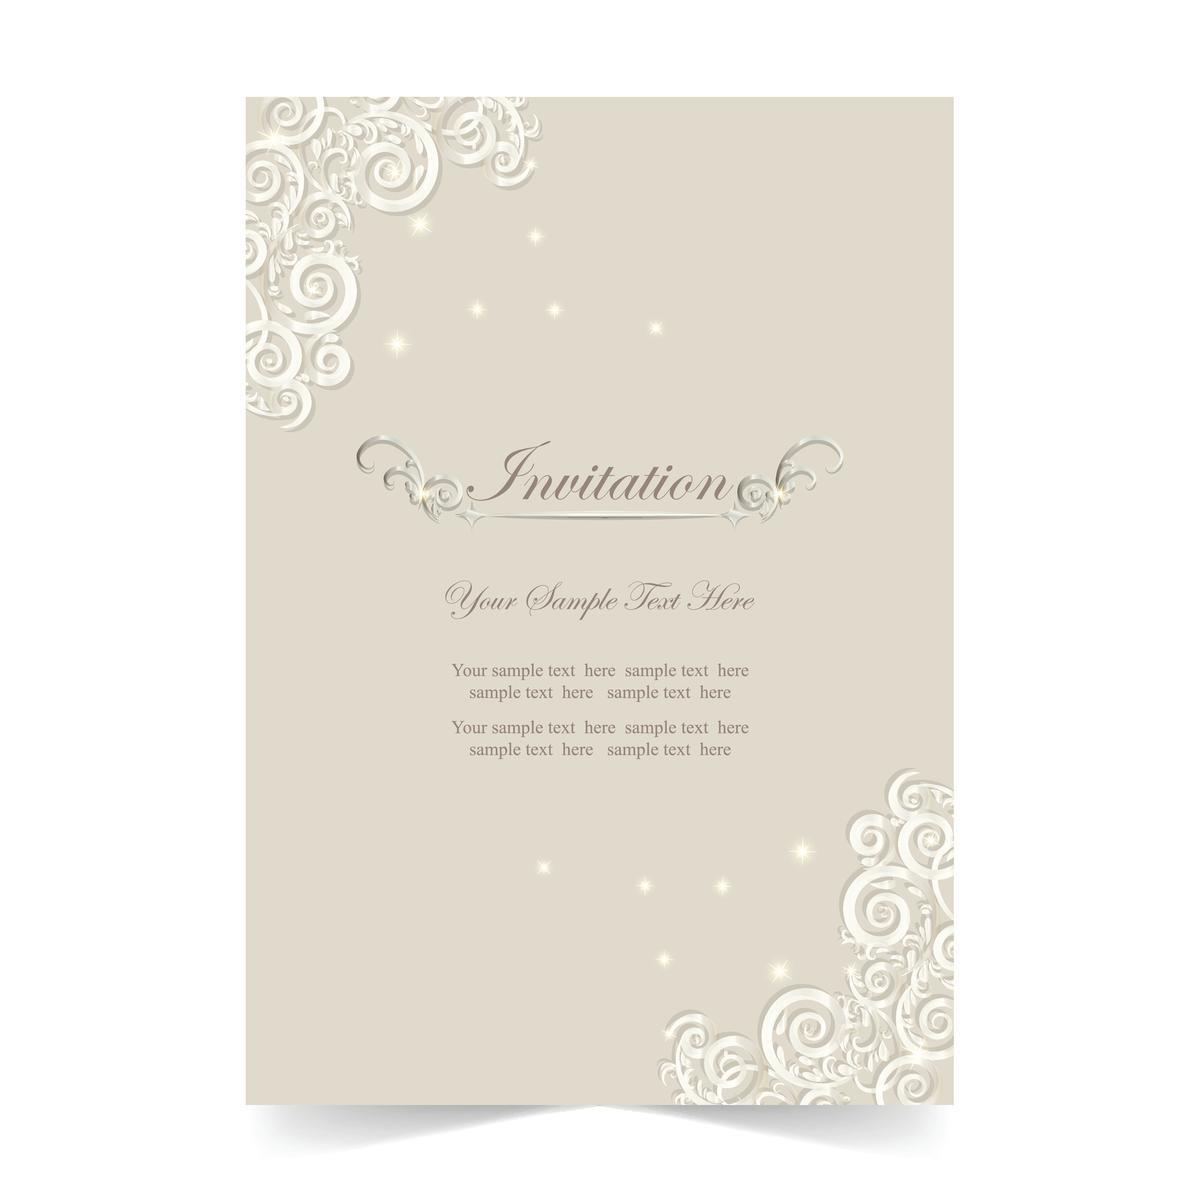 invitation card text